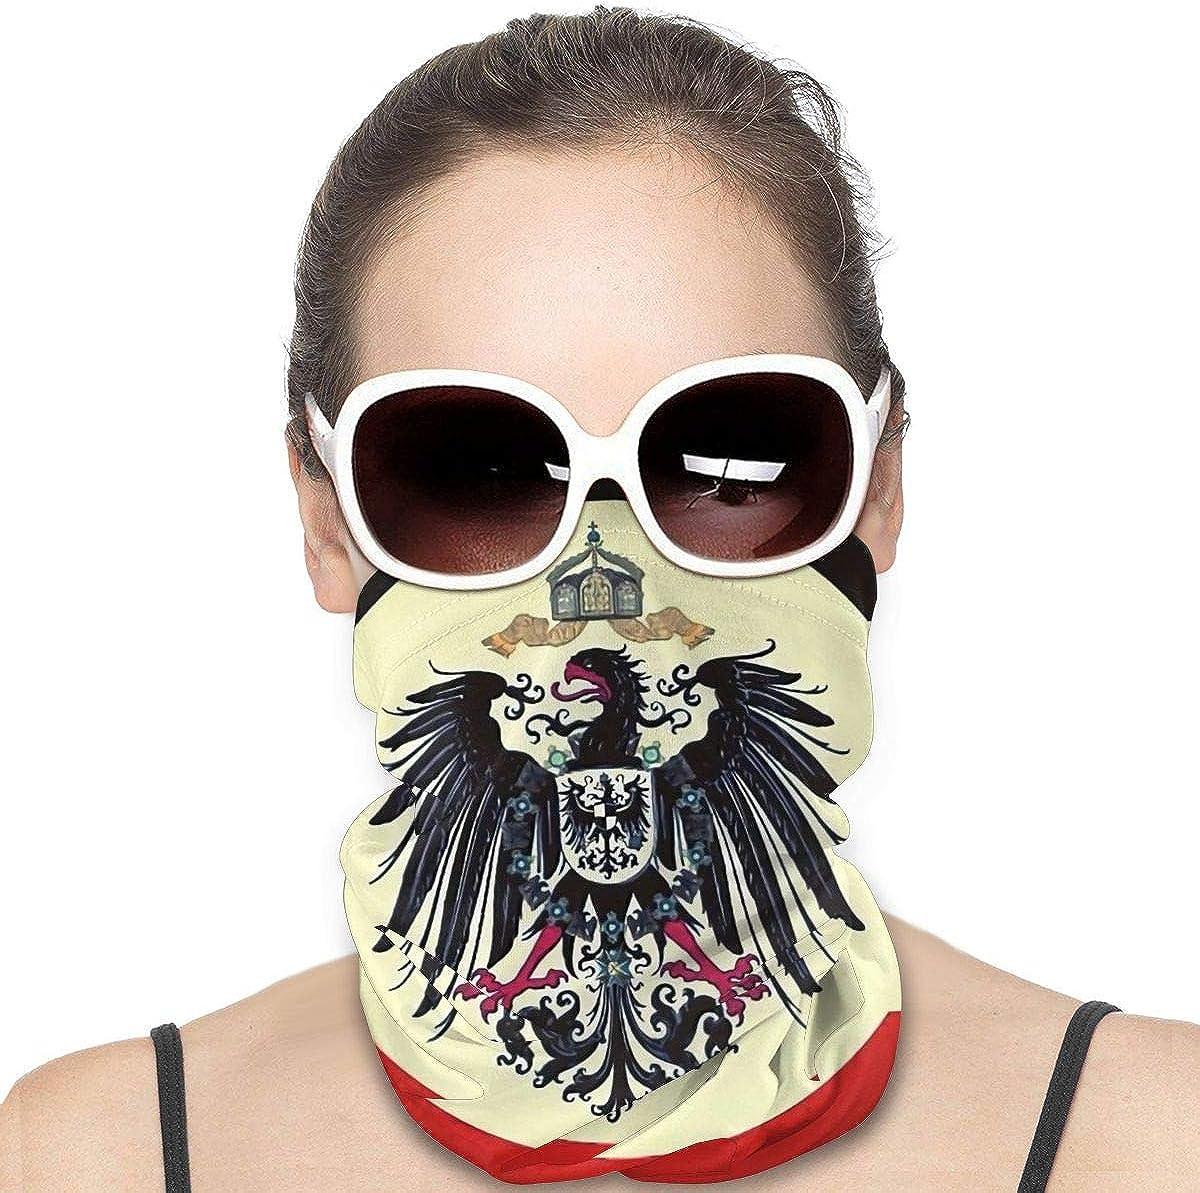 Tidyki Bandana Face Mask - Old German Coat of Arms Bandana Face Mask Neck Gaiter Multifunctional Headwear Head Bands Neck Warmer Men Headwear Face Mask Bandana